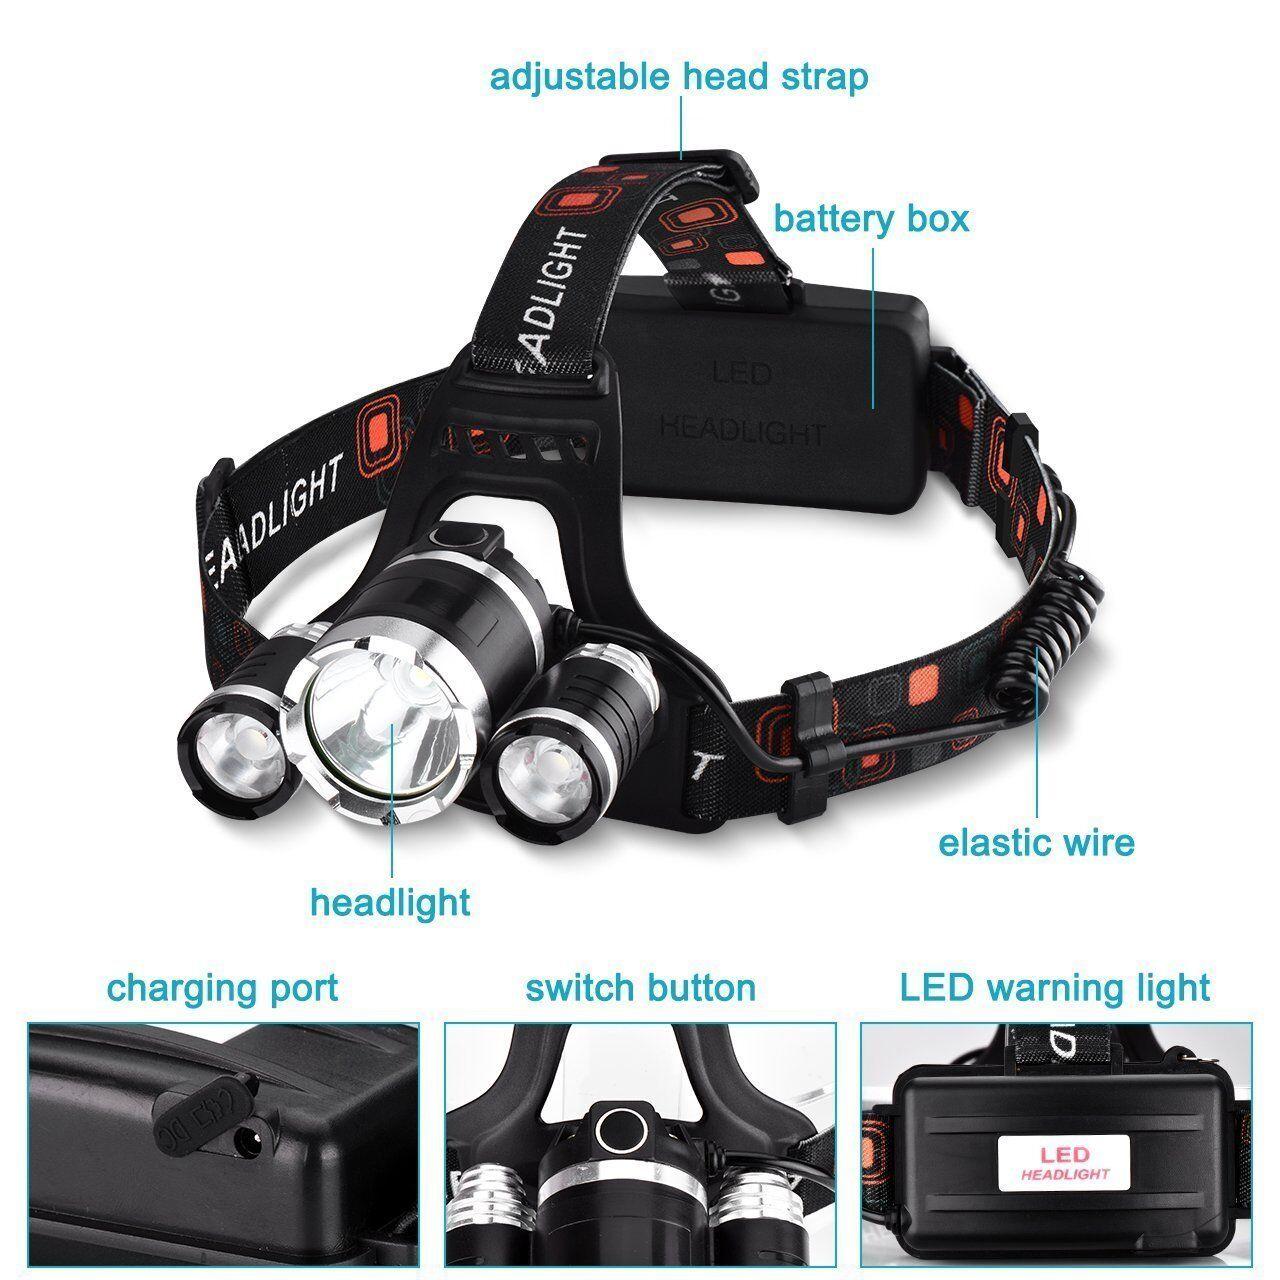 Linterna Frontal LED Para Camping Pesca Ciclismo 4 Tipos de Luz 6 Horas Duracion